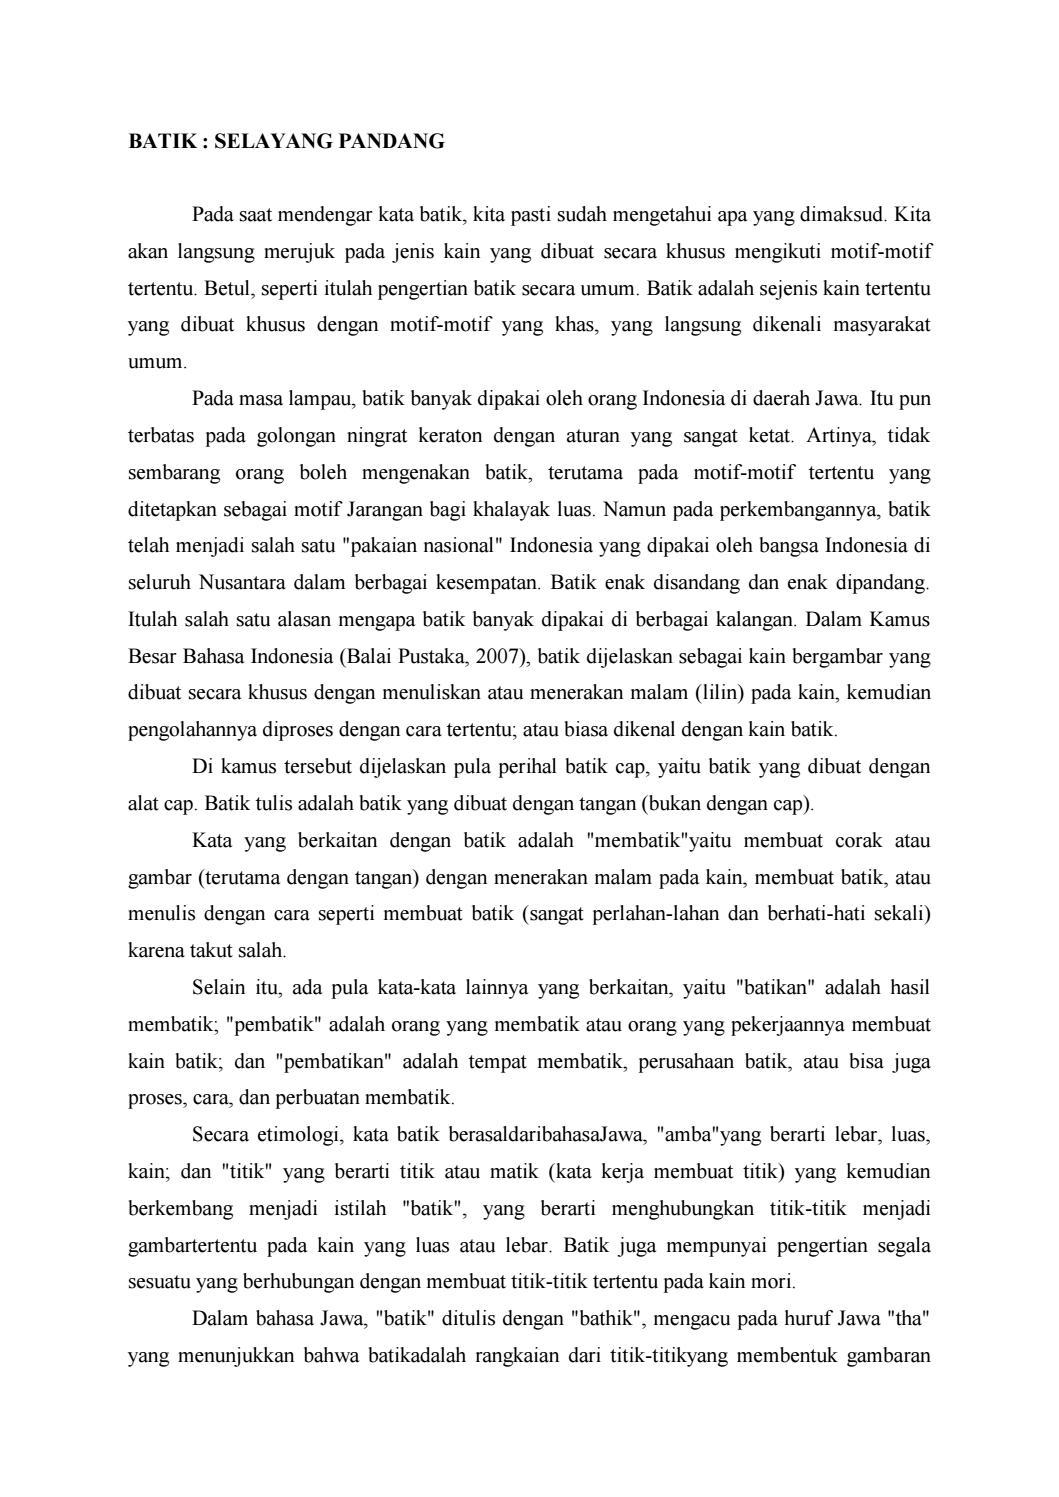 Batik nusantara by batikklasik1745 - issuu cb41fe4d3d